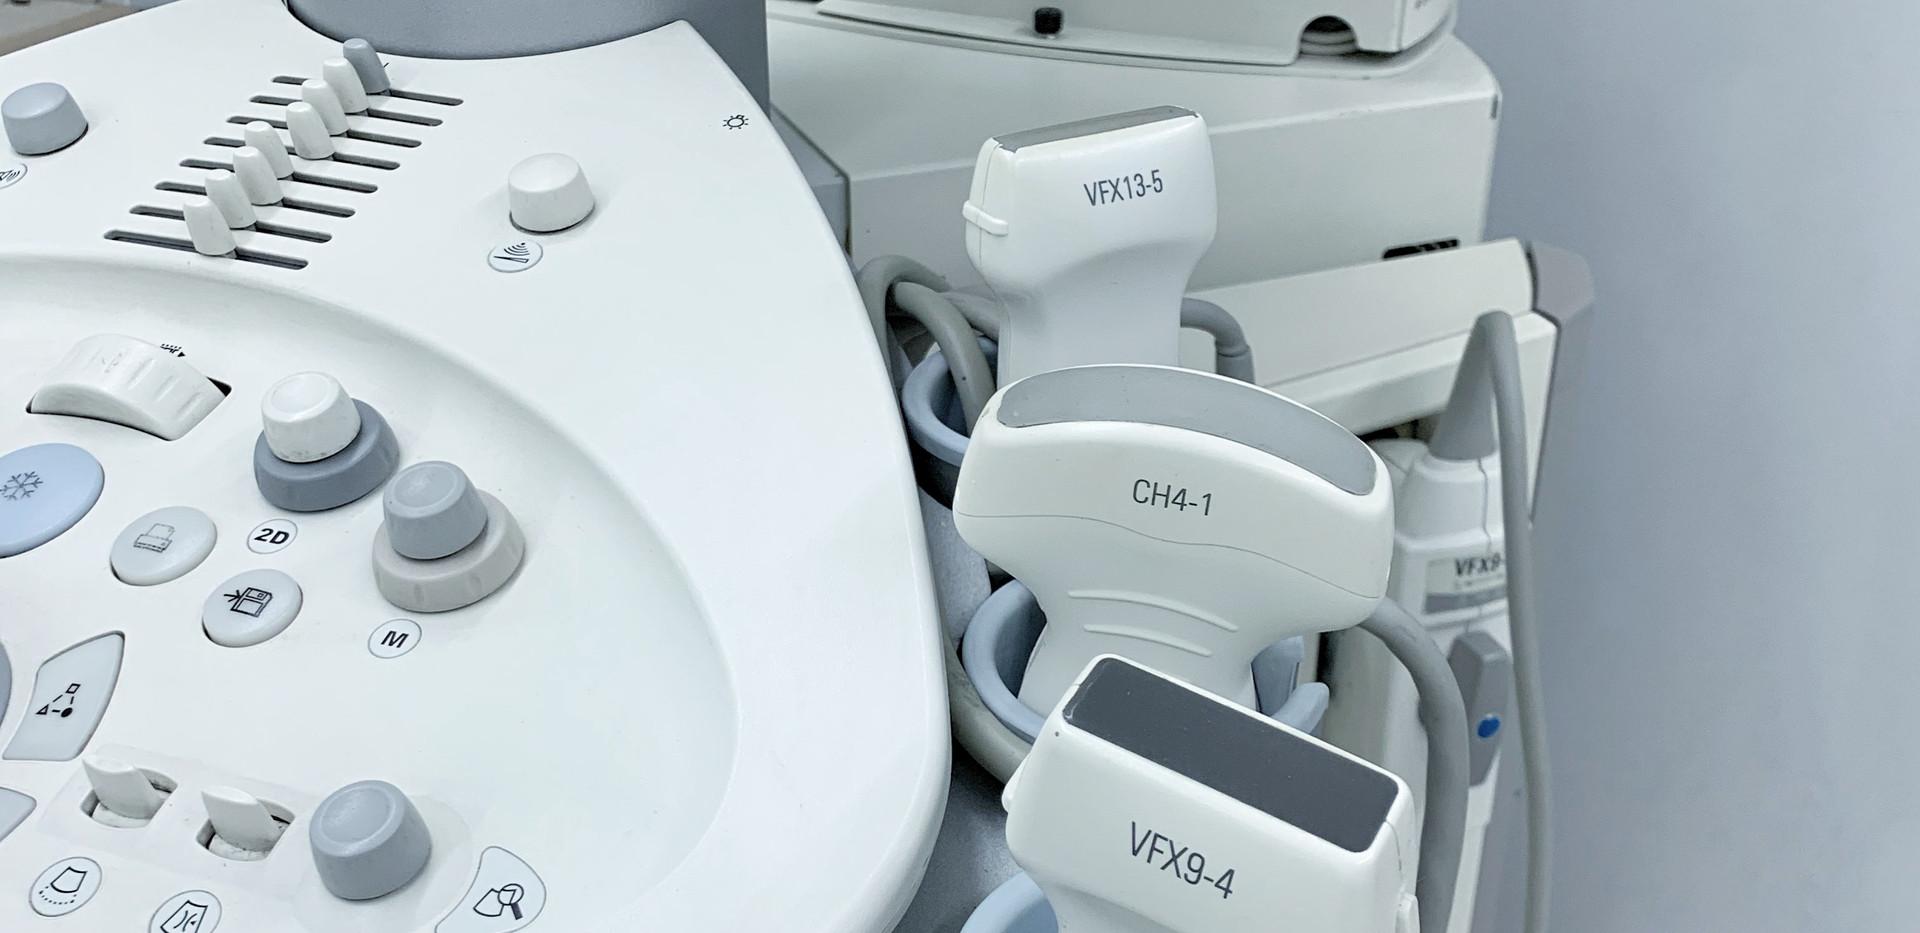 Siemens Sonoline Antares Ultrason Cihazı